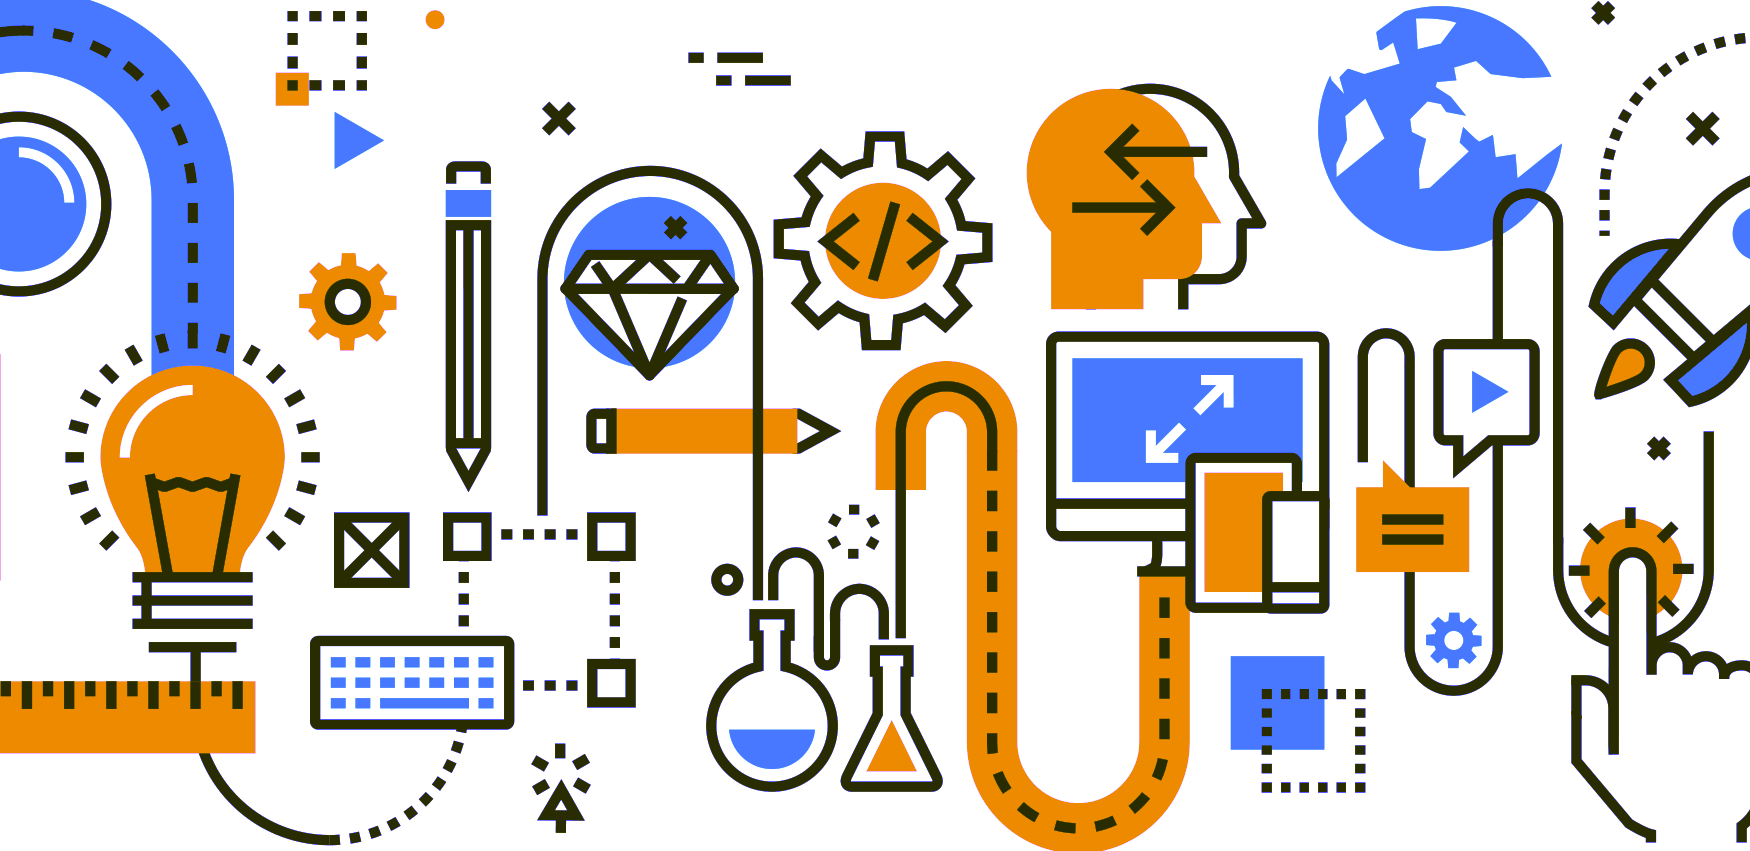 SharePoint DIY: Create a Custom WorkFlow Form